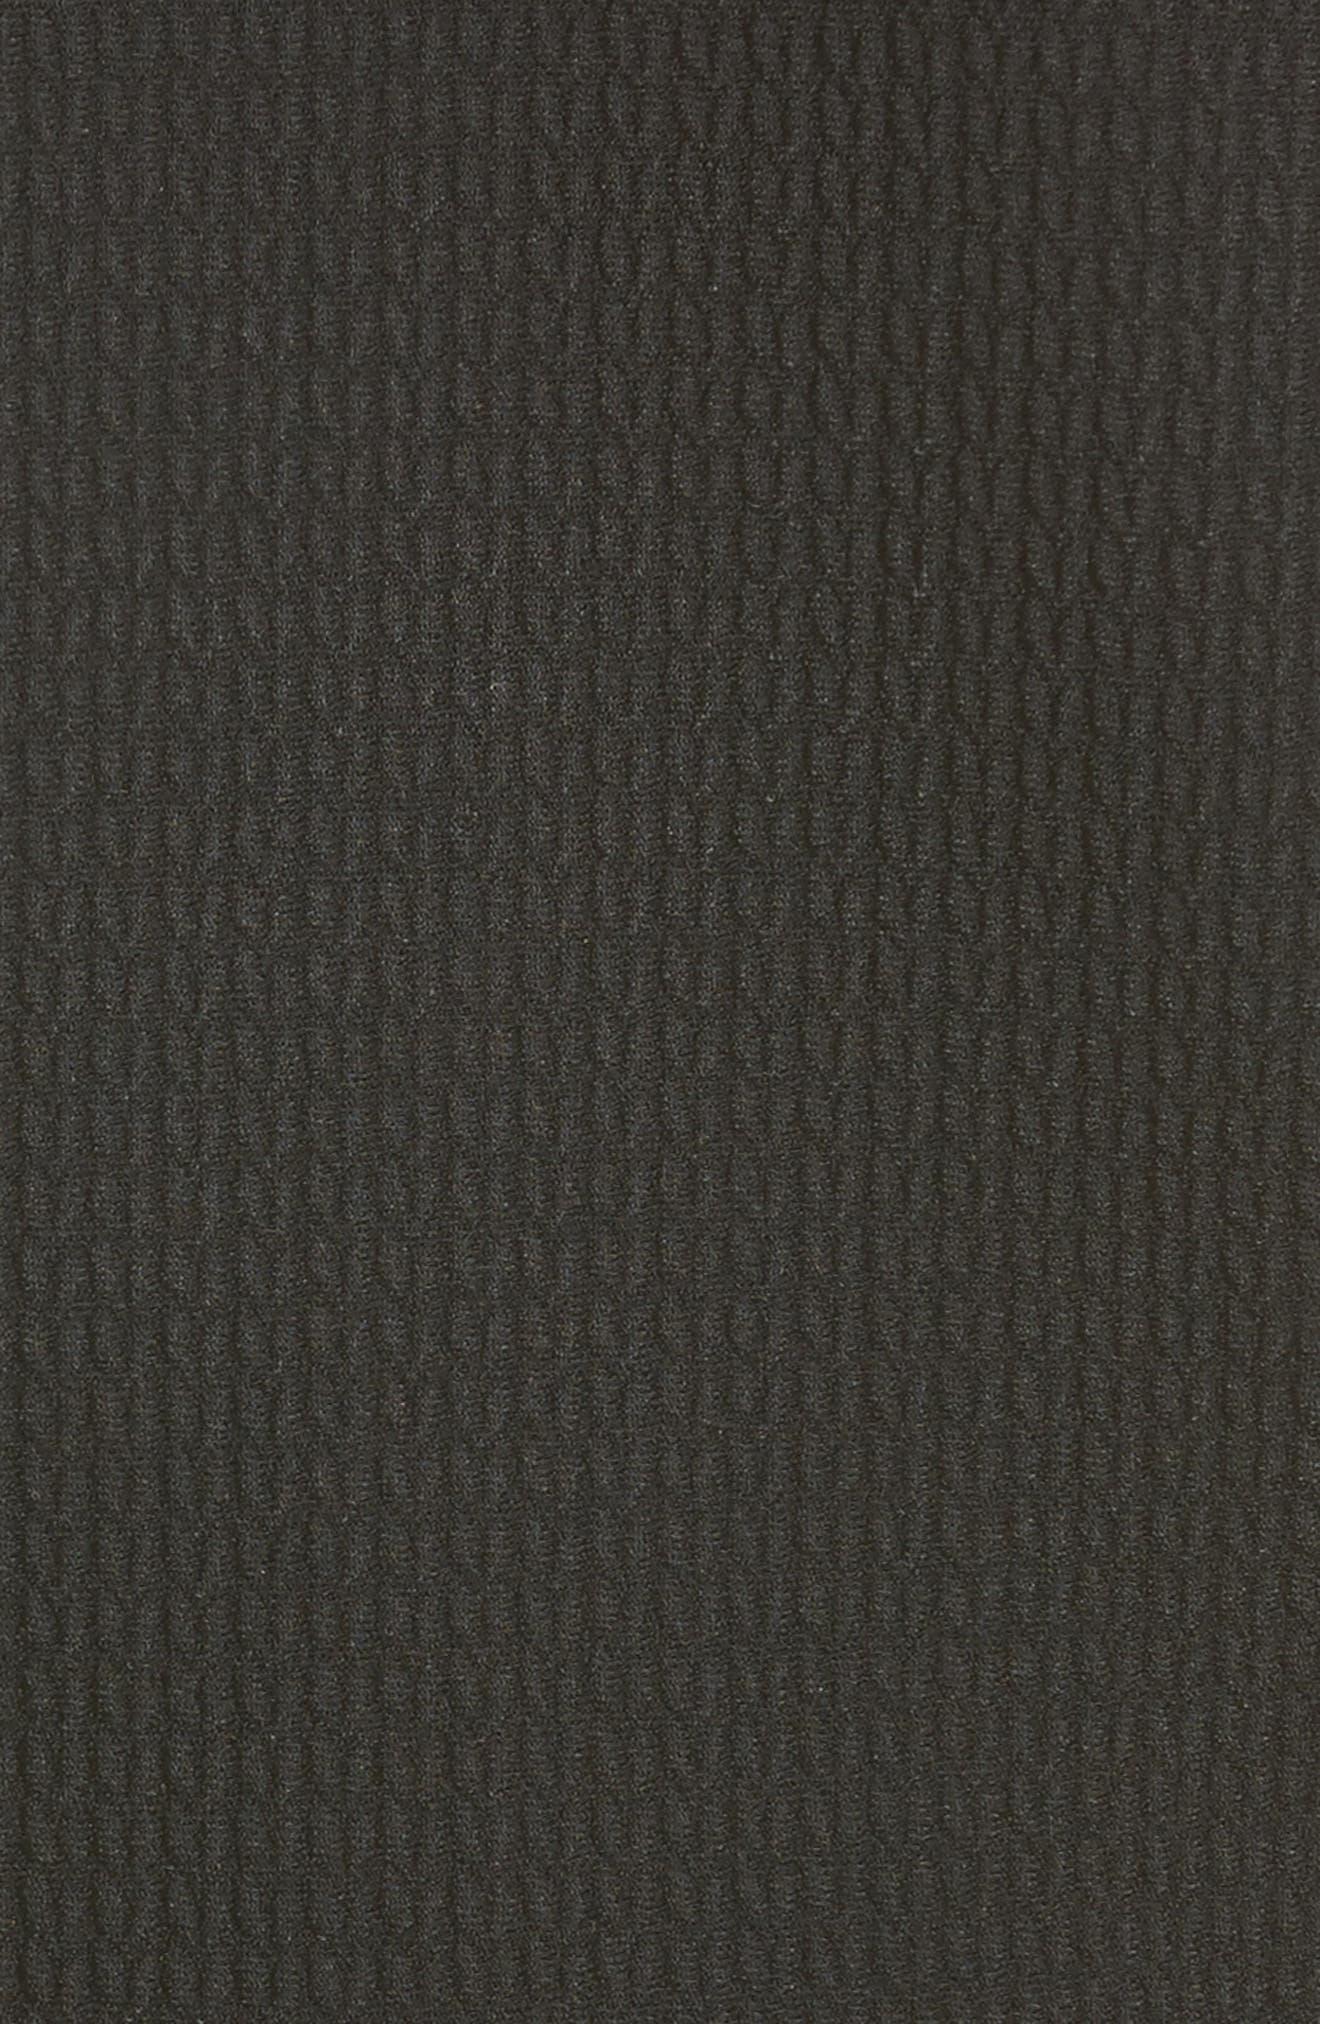 Bicolor Contrast Jacquard Peplum Cardigan,                             Alternate thumbnail 3, color,                             Black/ Ivory